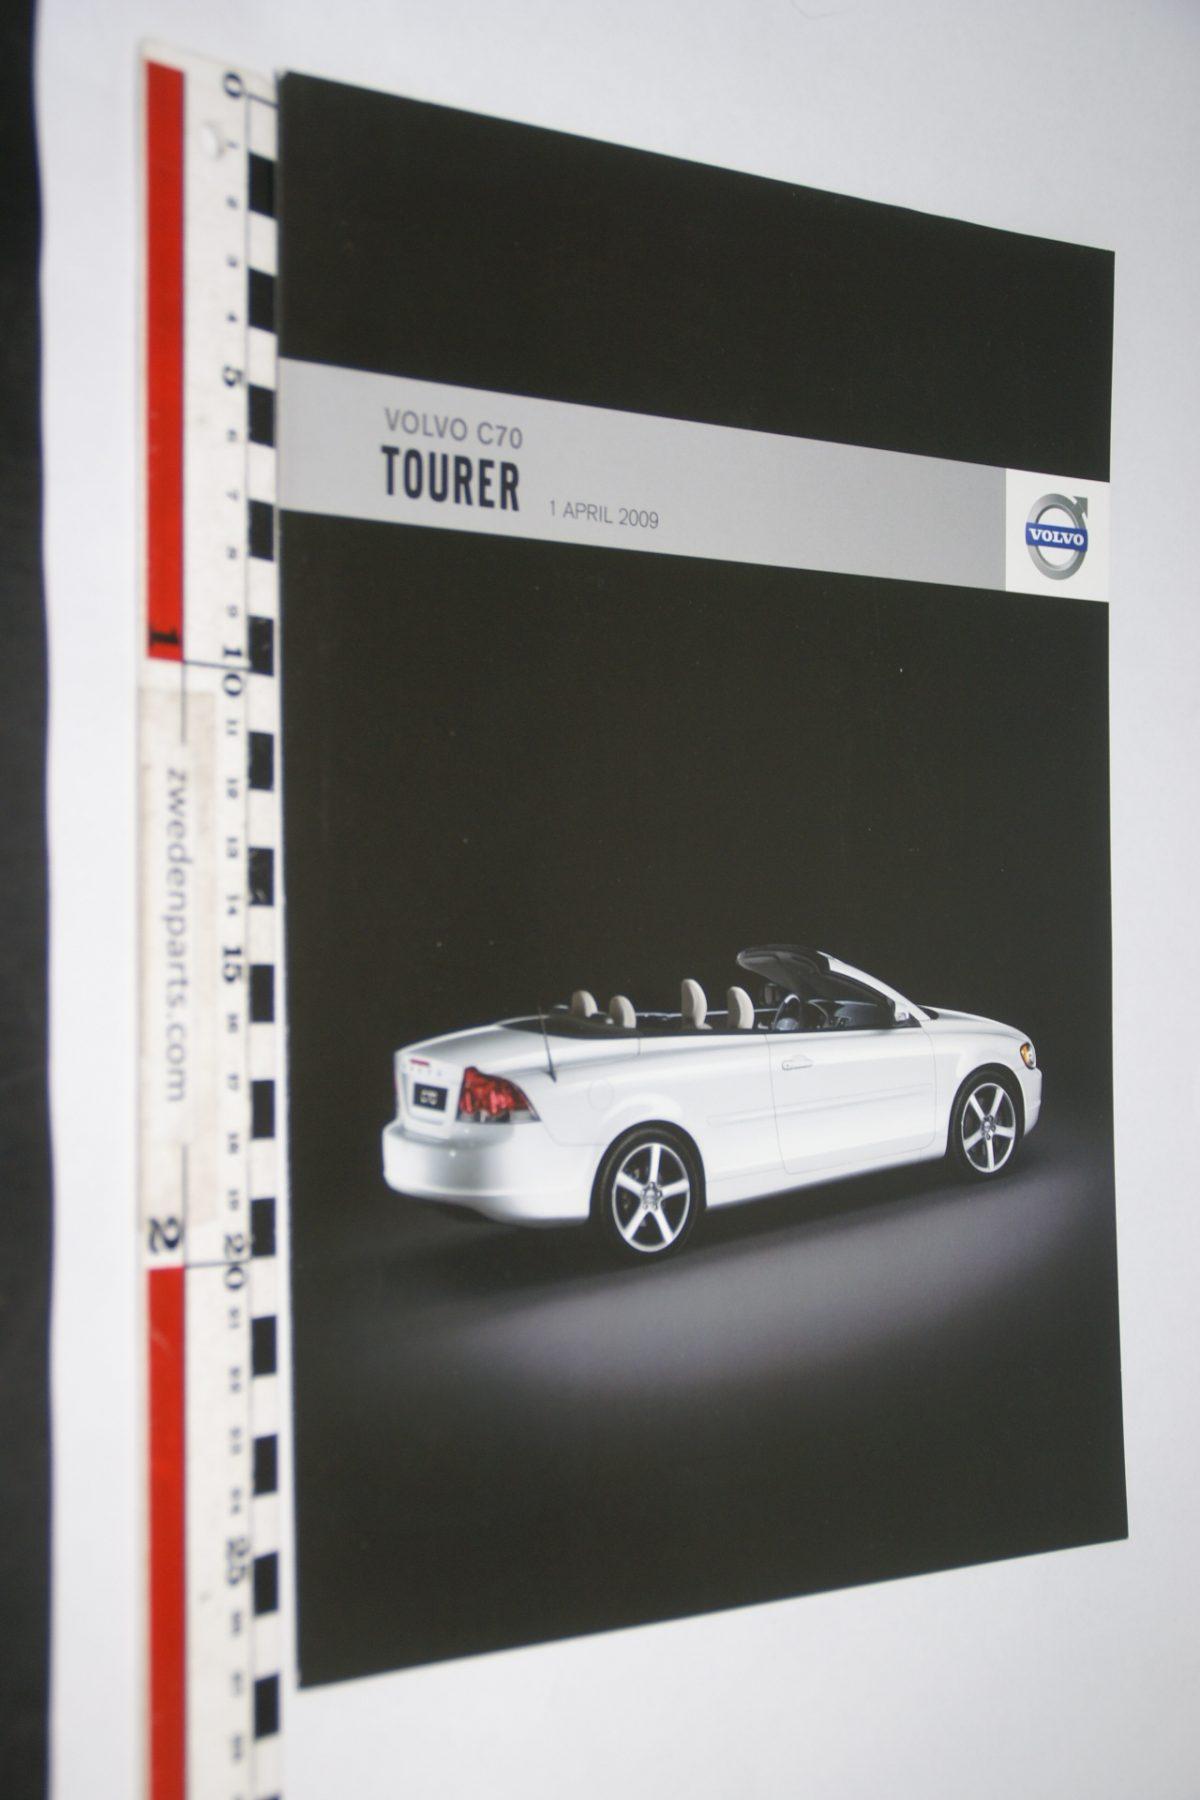 DSC06298 2009 april brochure Volvo C70 Tourer